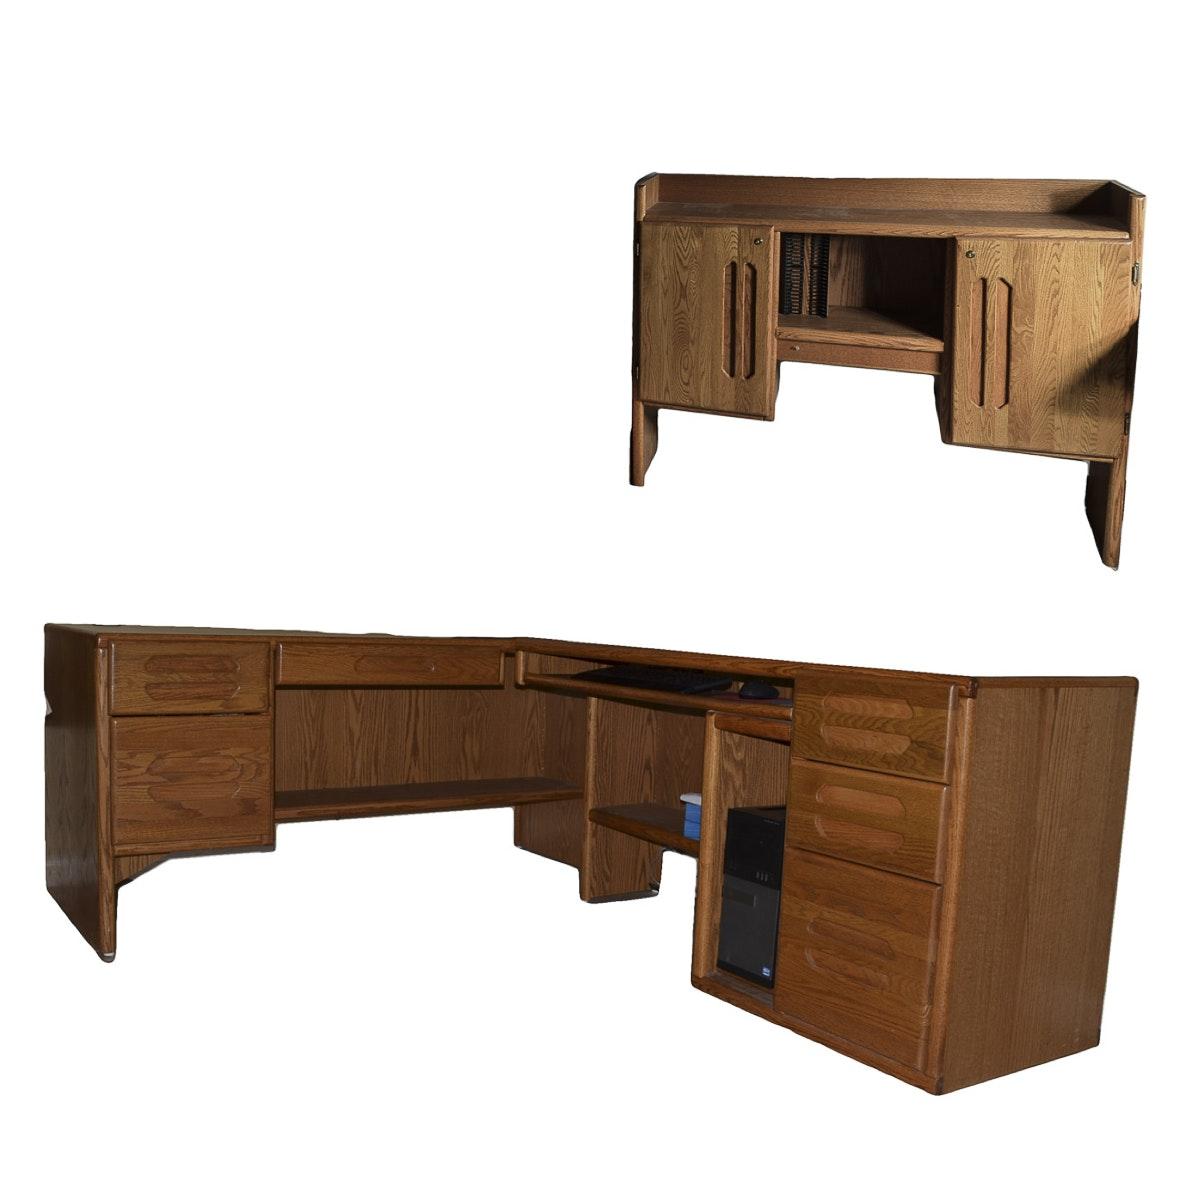 Two-Piece Oak Desk Set with Hutch